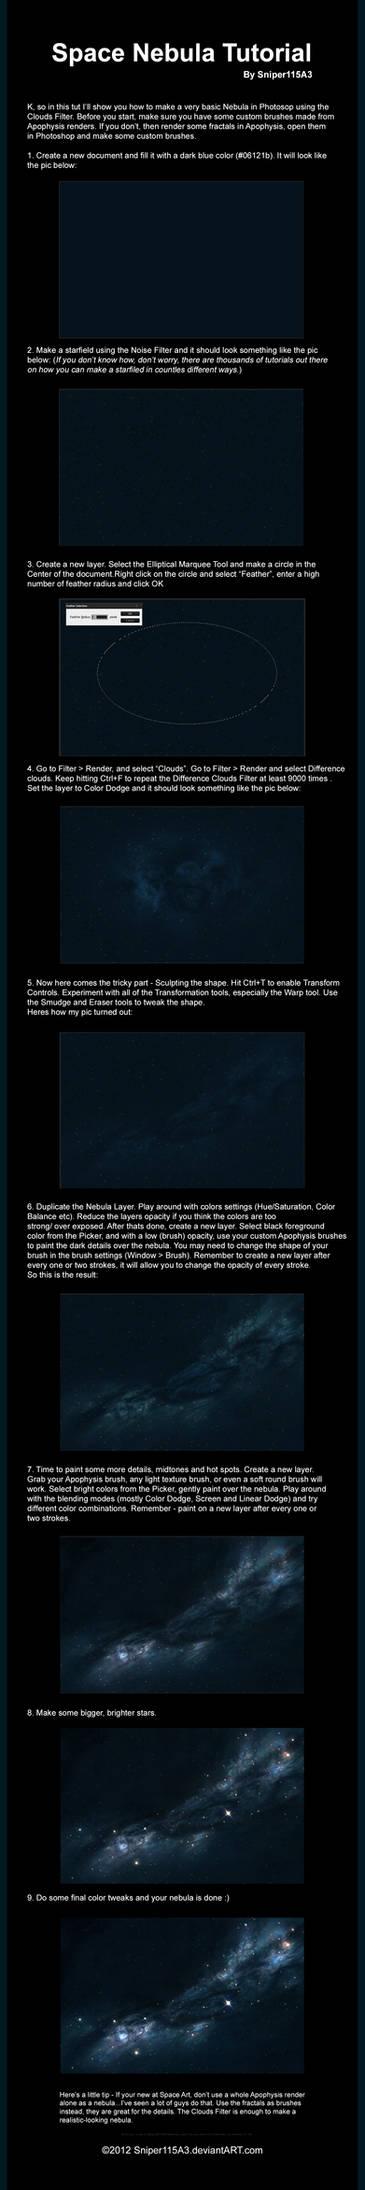 Space Nebula Tutorial by Sniper115A3